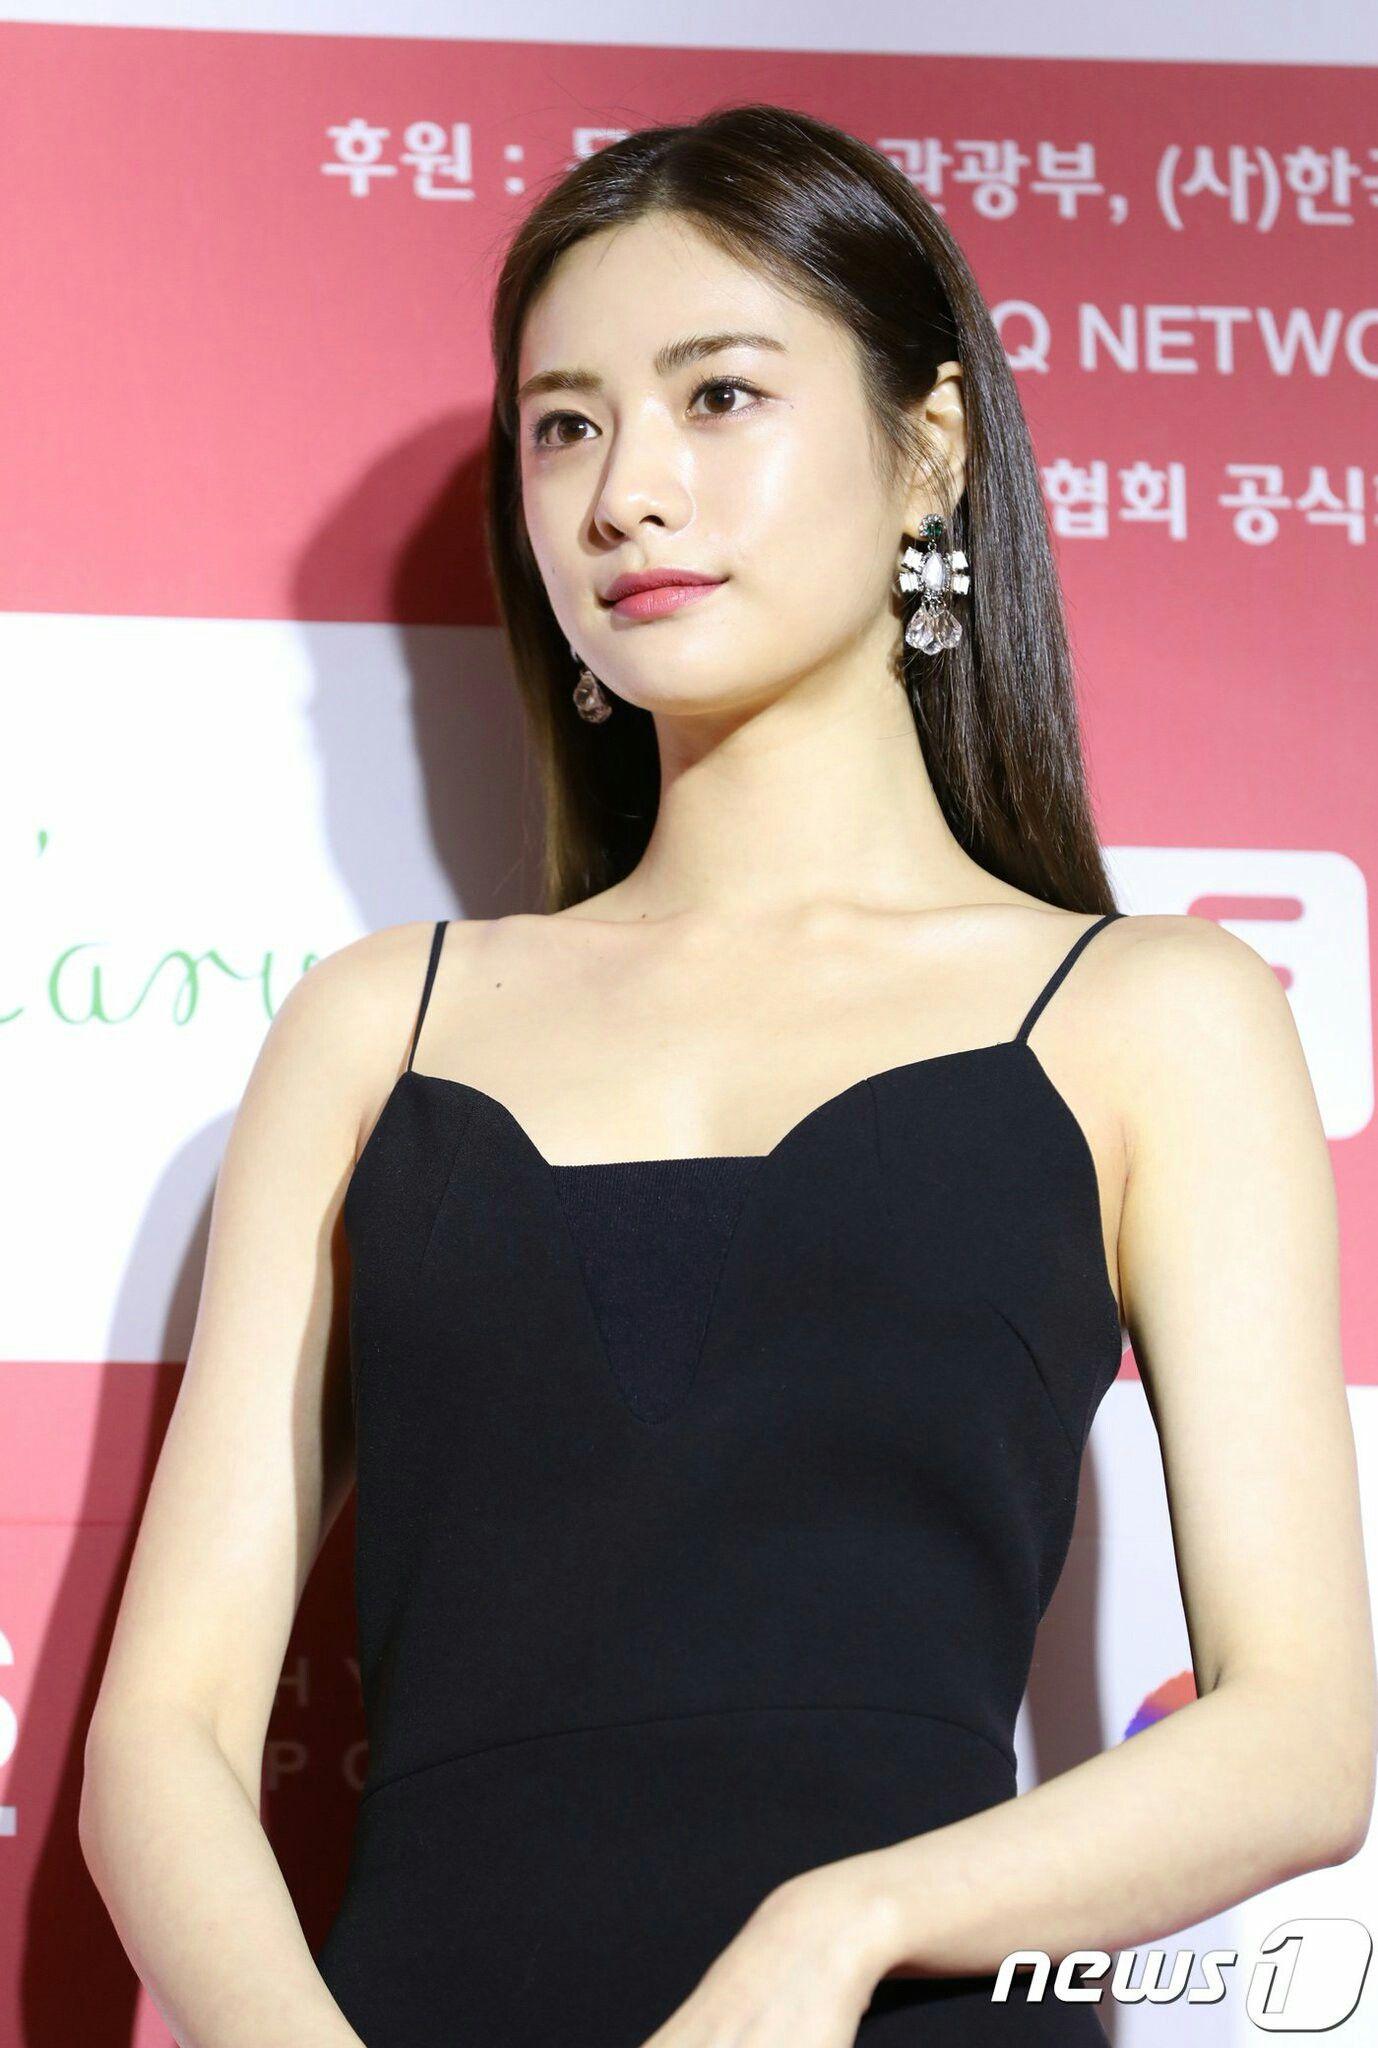 Nana at Korea Top Artist Award Nana ImJinAh 애프터스쿨 나나